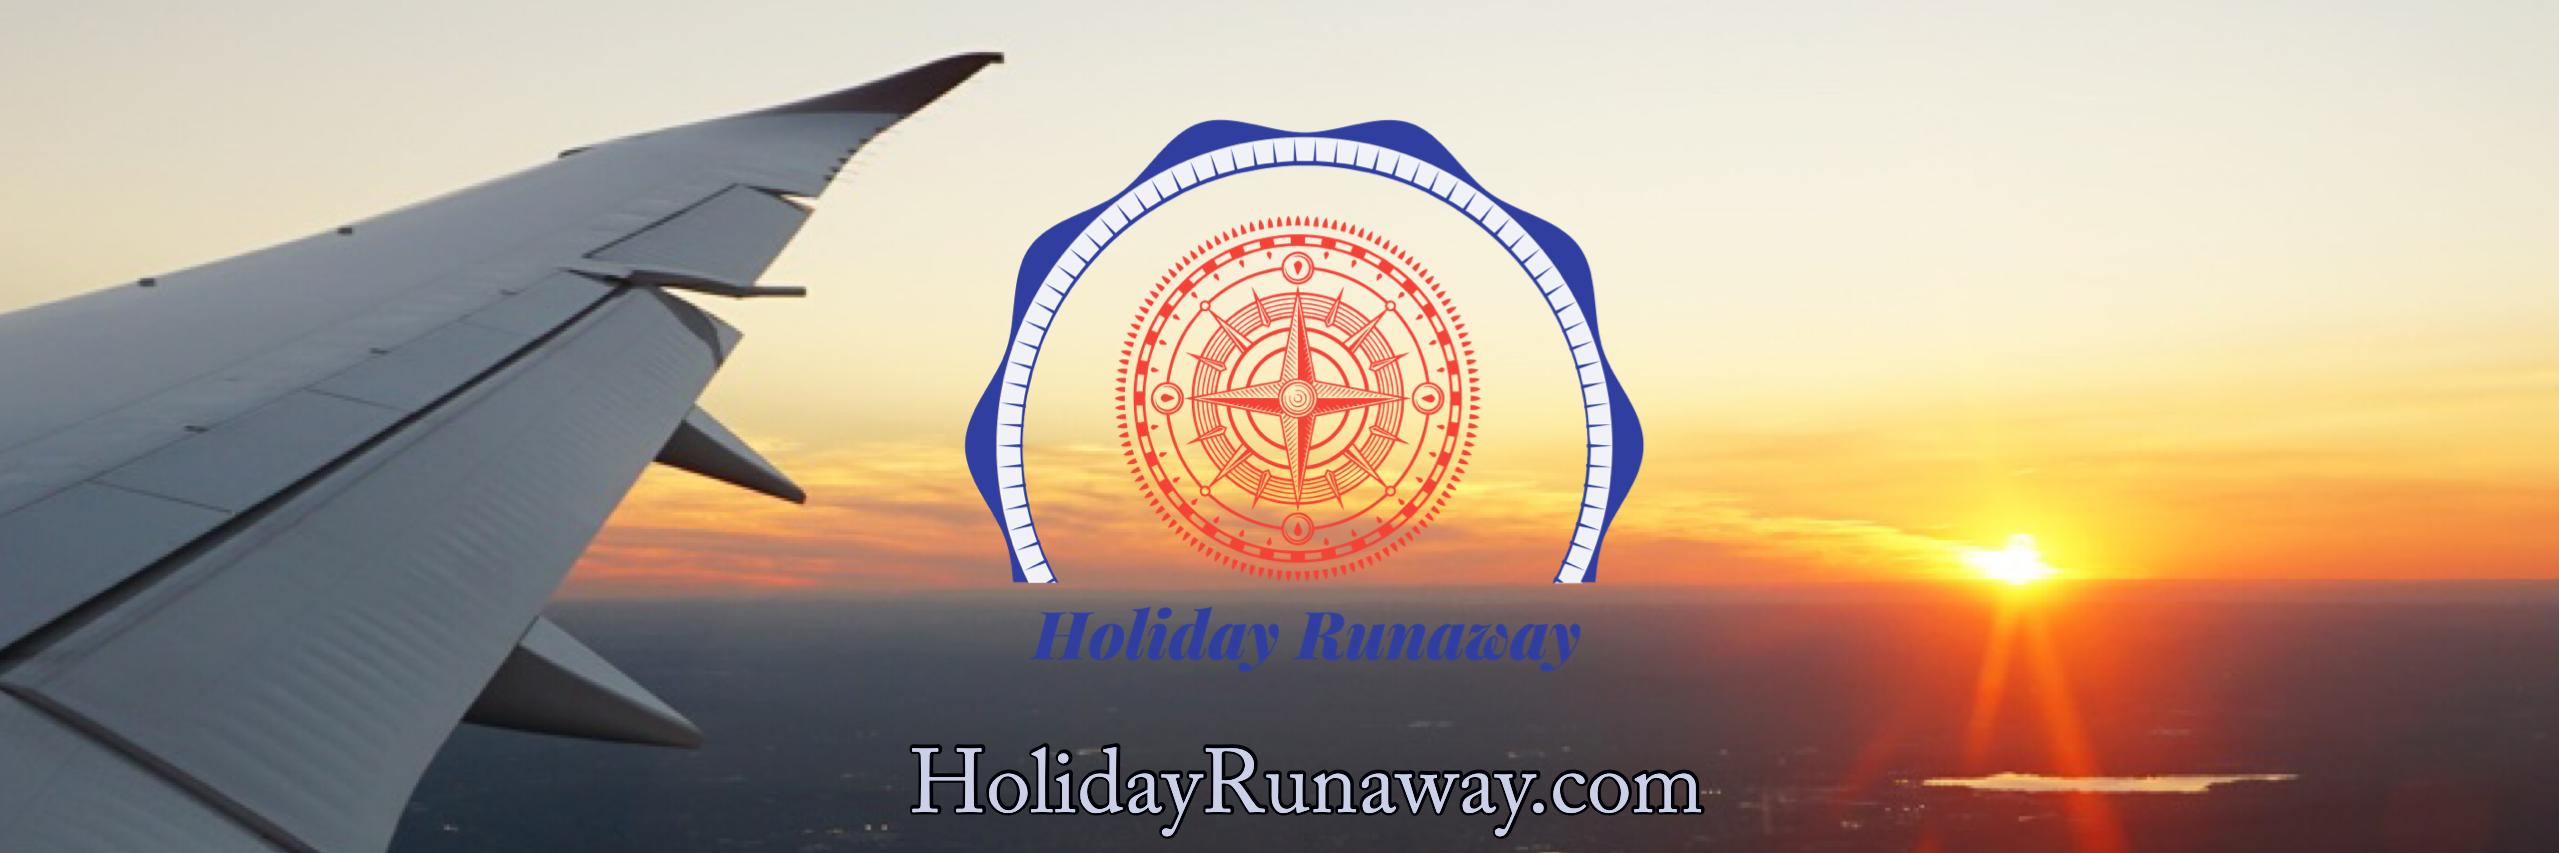 Holiday Runaway